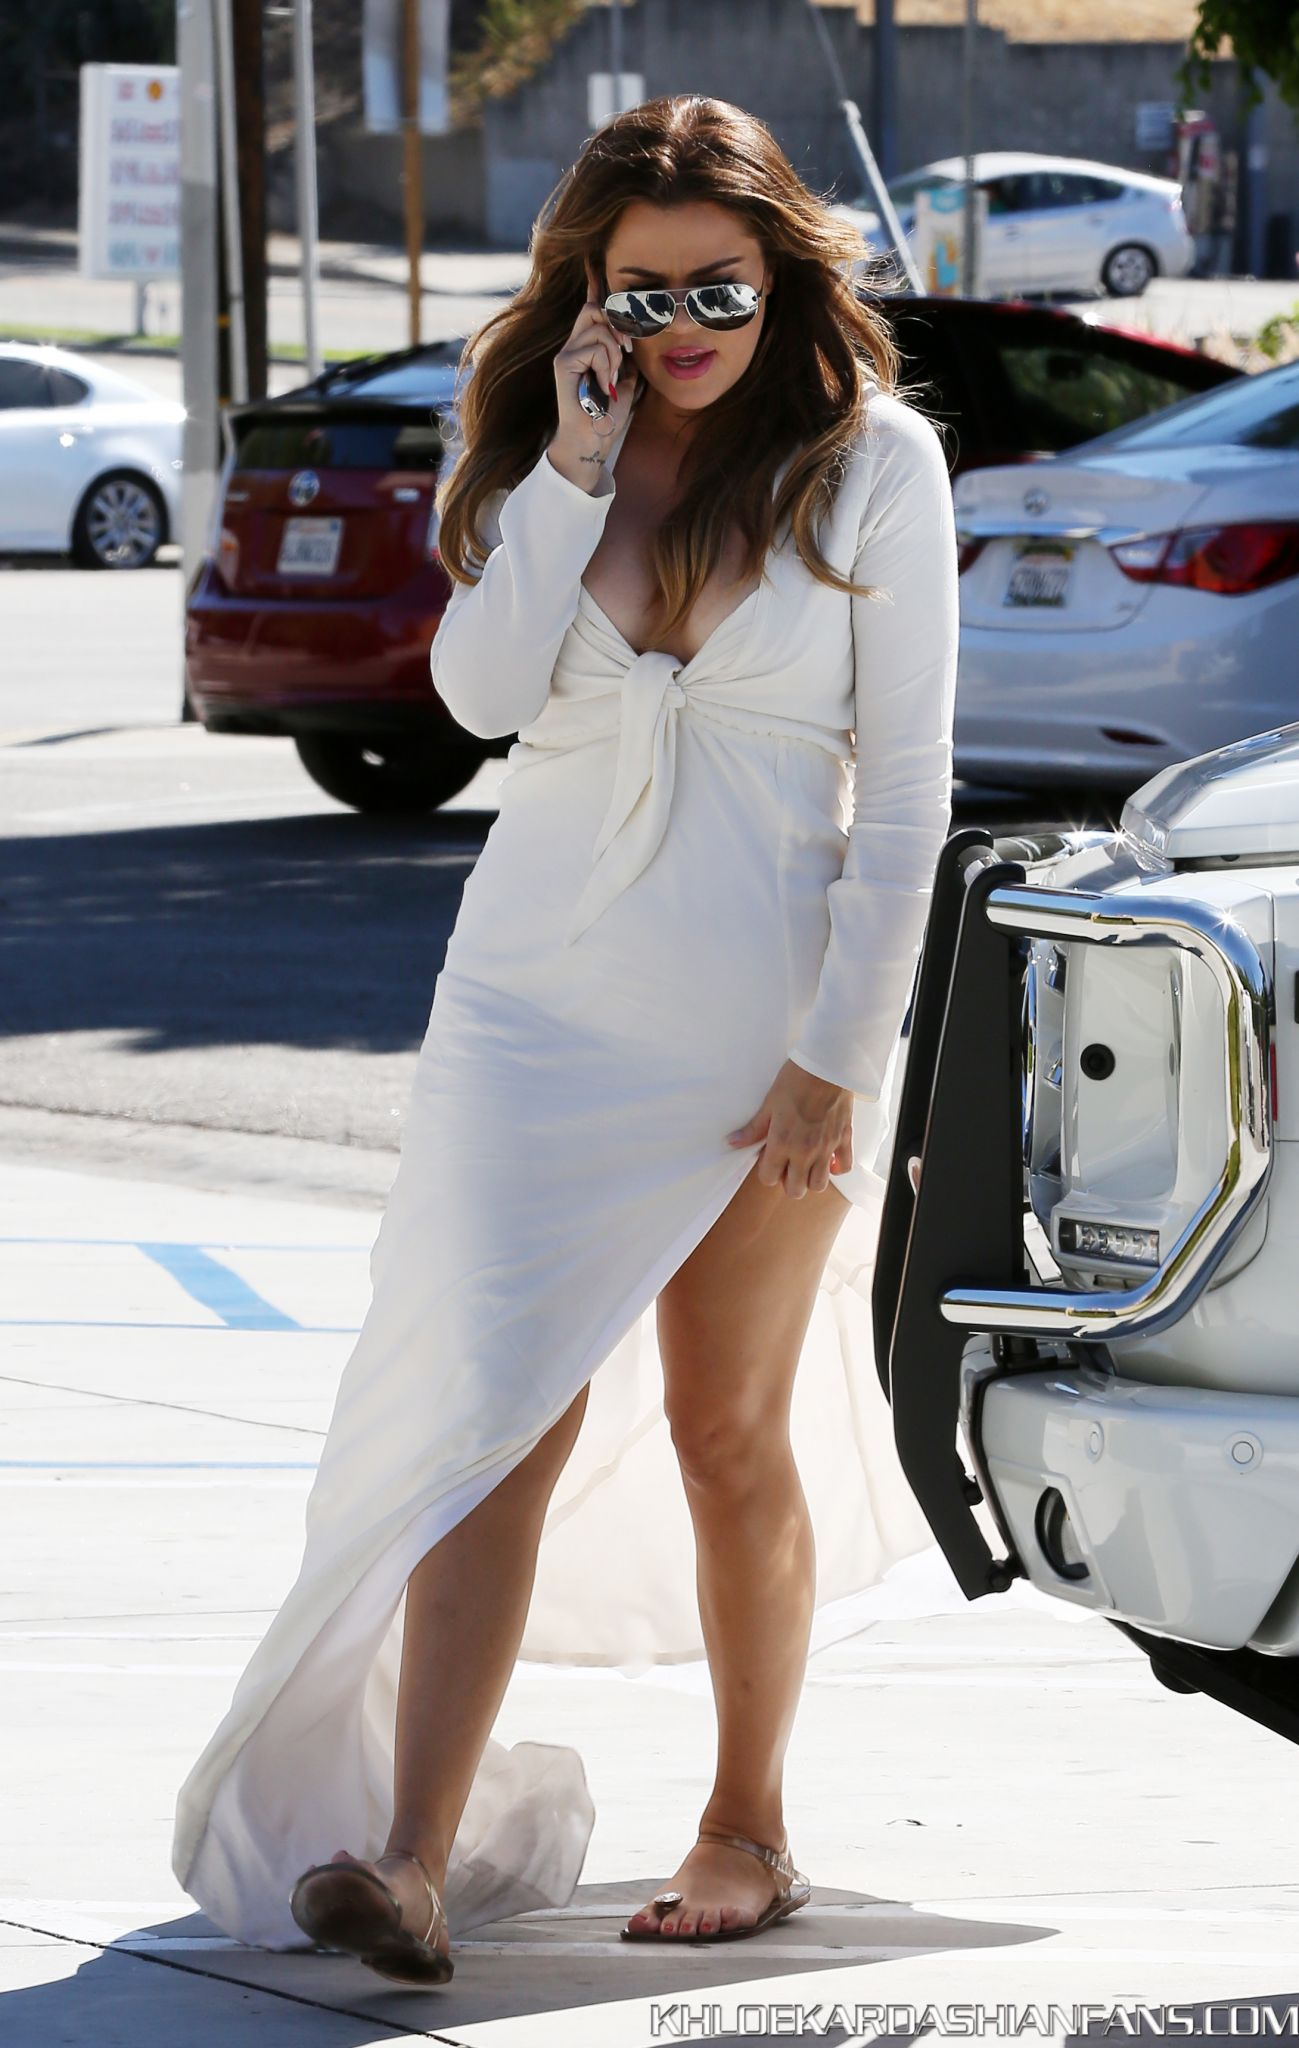 Khloe Kardashian 2014 : Khloe Kardashian in White Dress -04